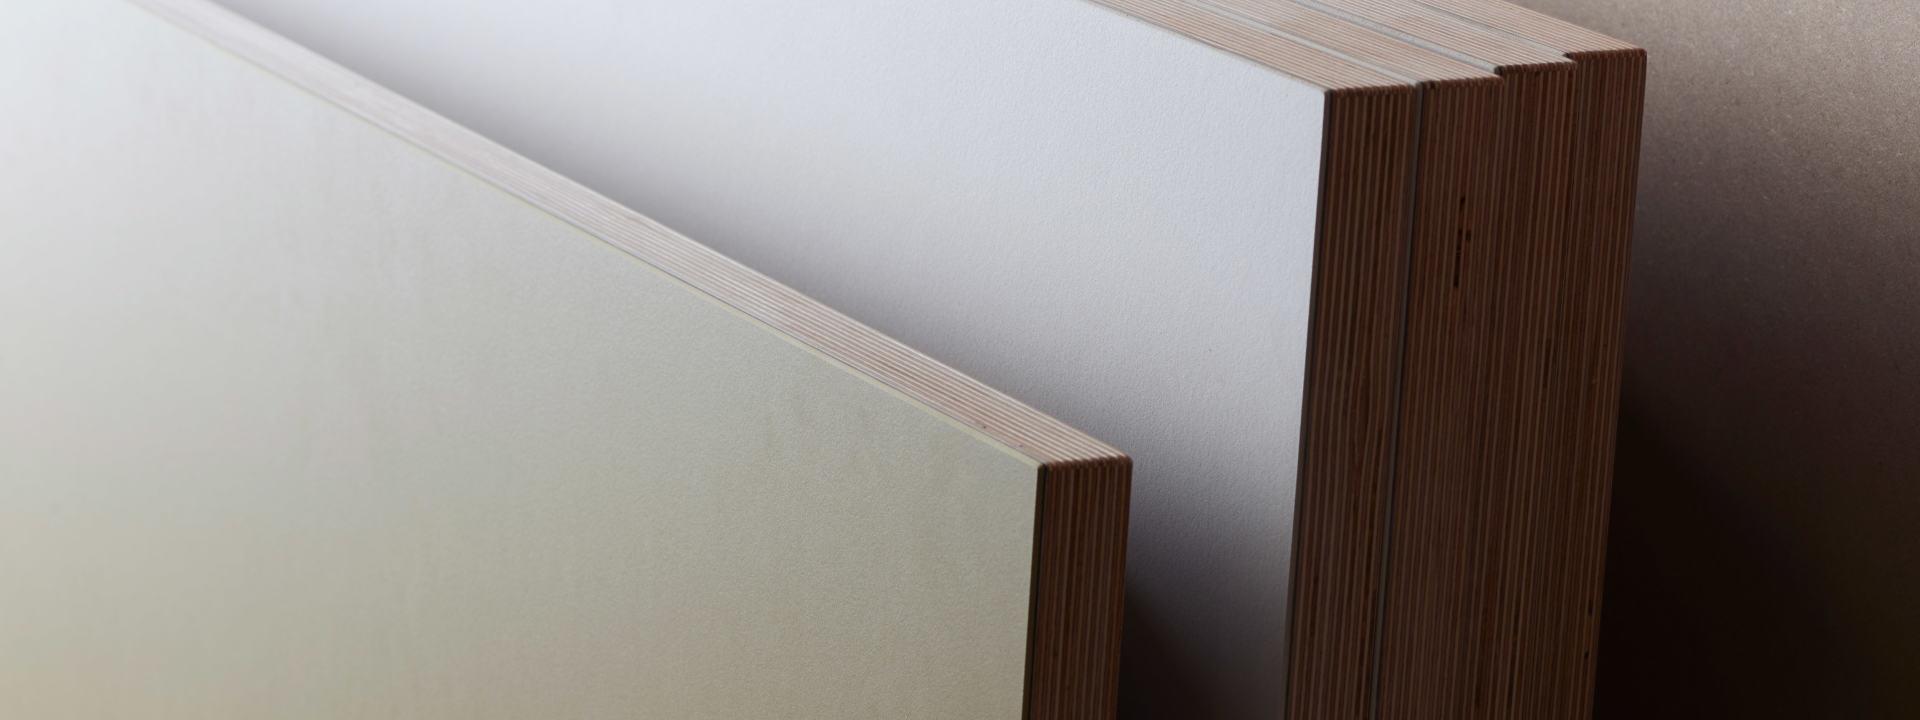 FLCustom Tabletops & Tables, Tables & Trestles, Linoleum Table Top, Linoleum, Custom linoleum table tops, Tip Top Tabletop, 3D, Free form table top, free form